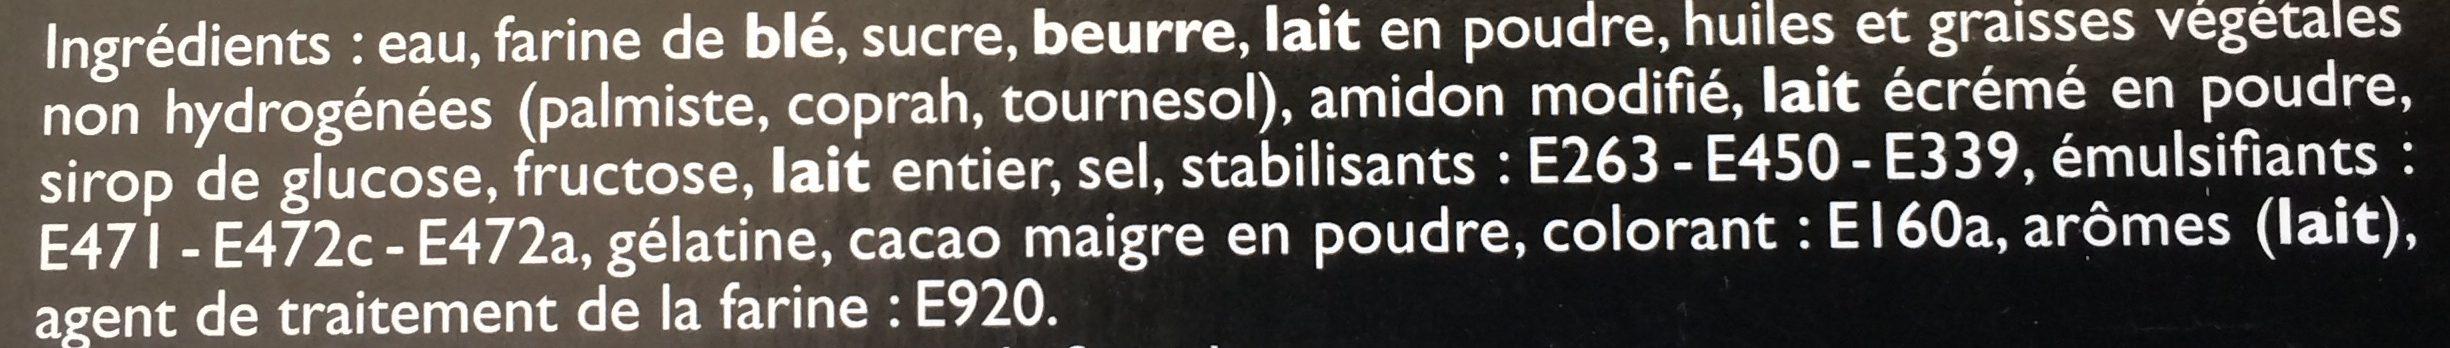 4 Millefeuilles - Ingrédients - fr